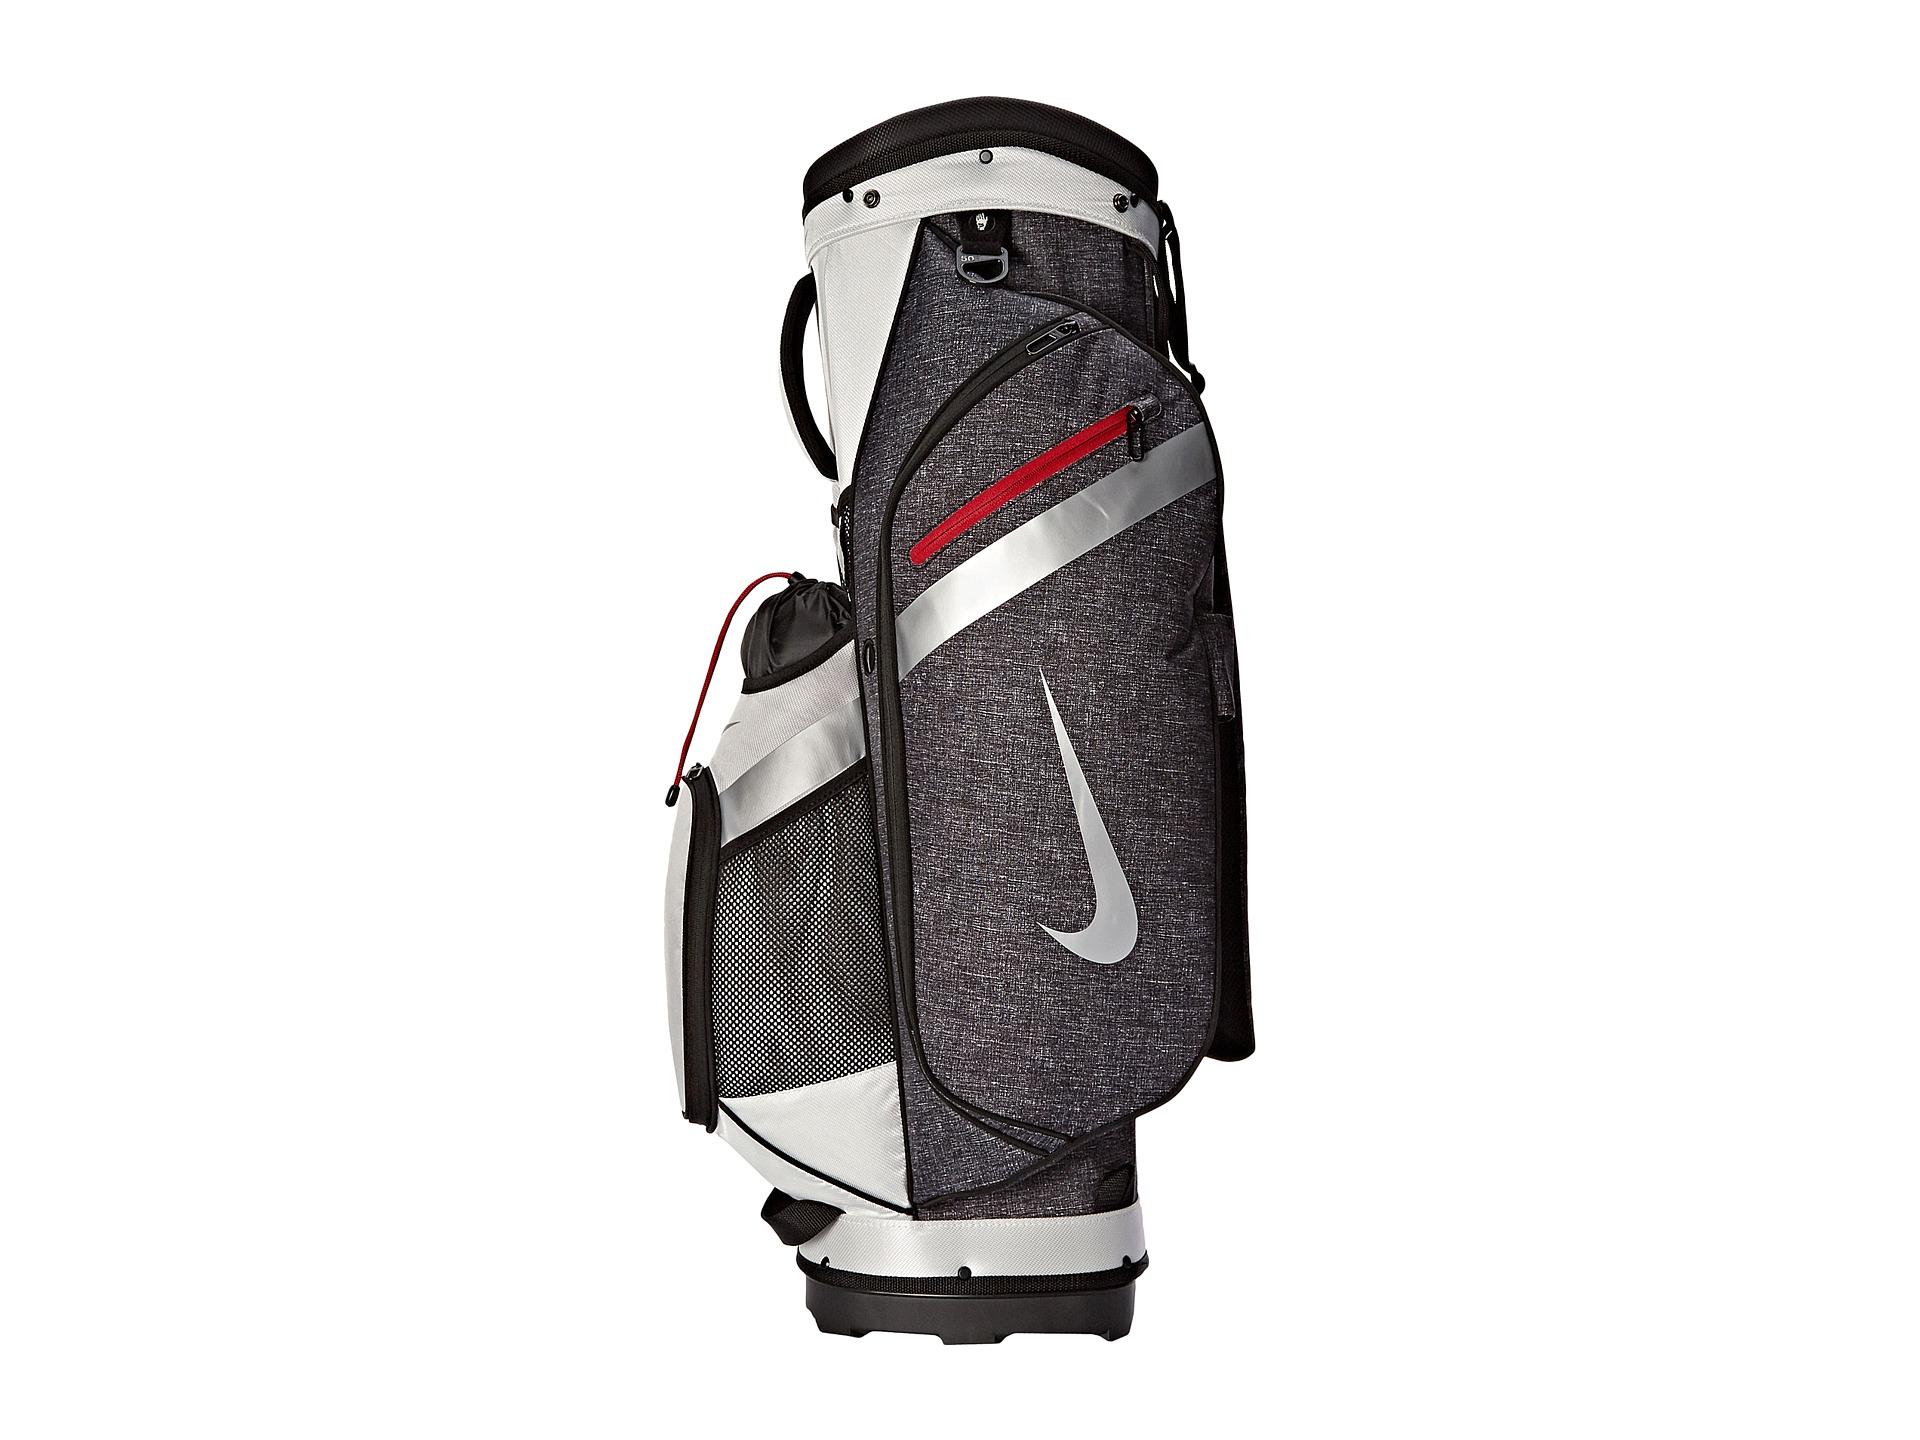 Lyst - Nike Sport Cart Iv in Black for Men ce601124651bc